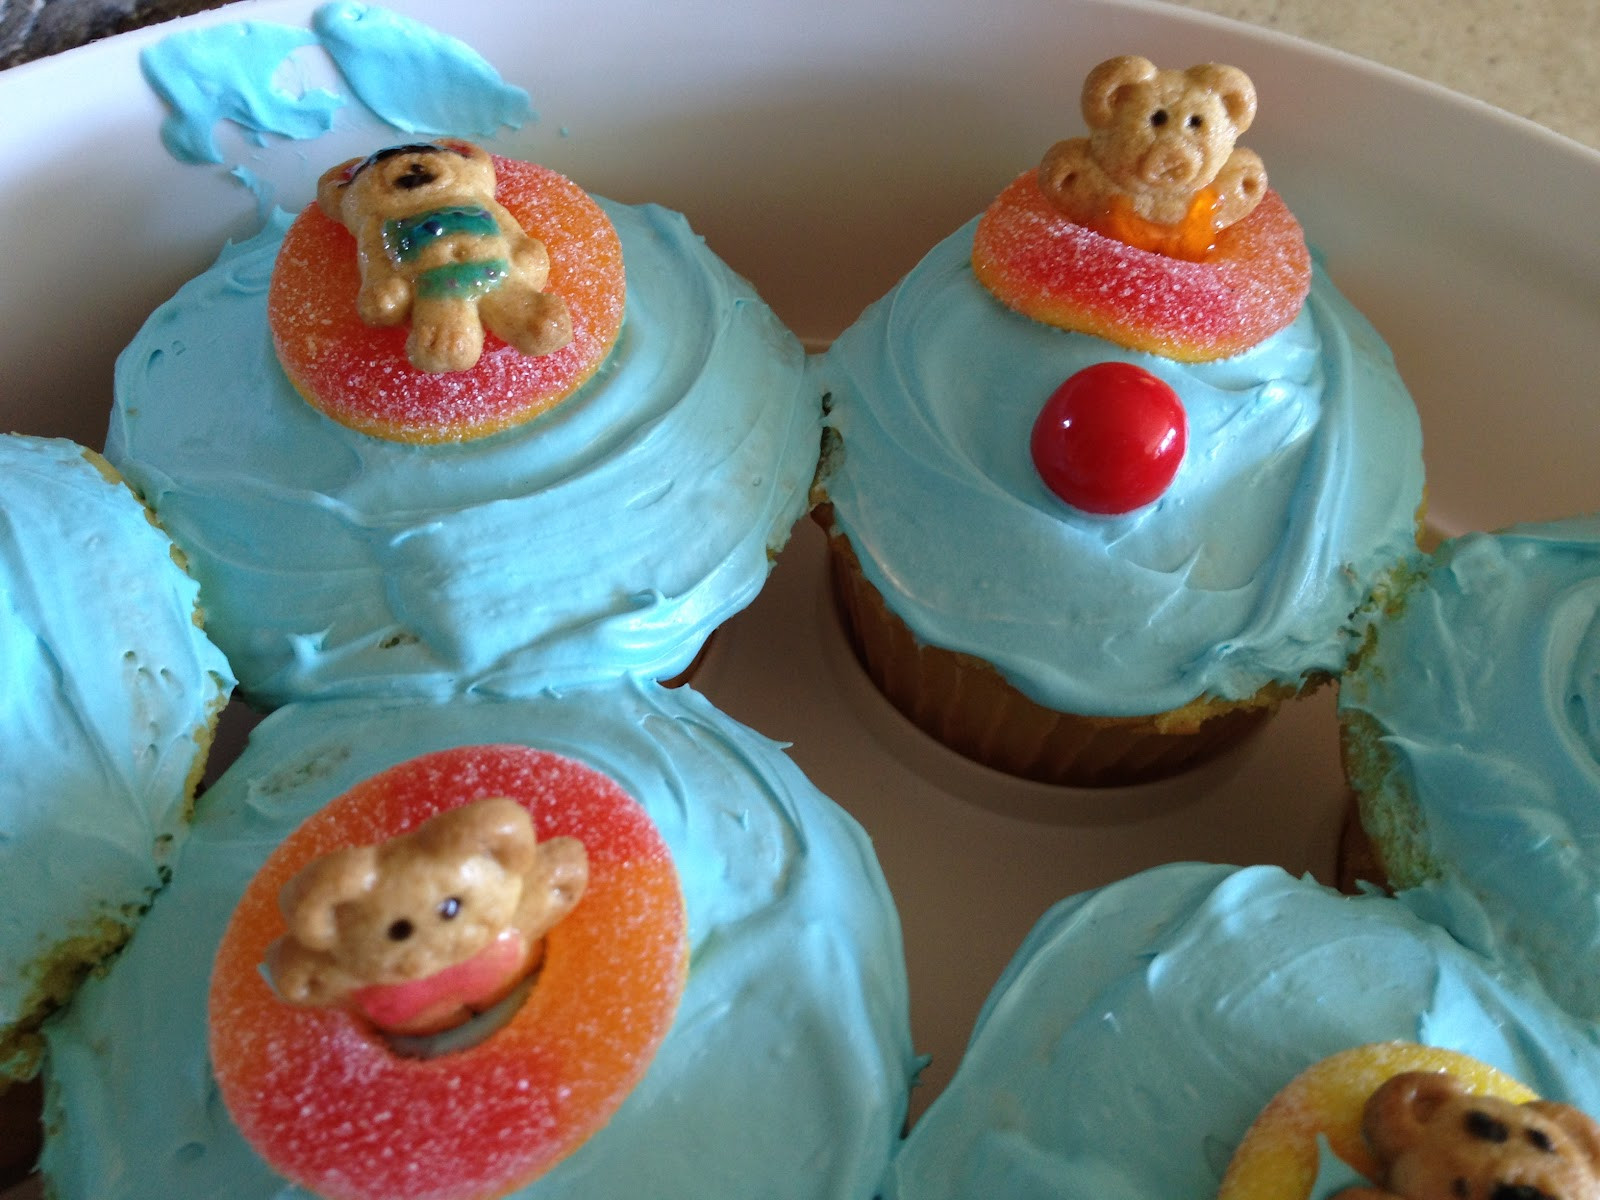 Summertime Desserts For Kids  Chicks That Cook Summer Dessert Fun with Kids